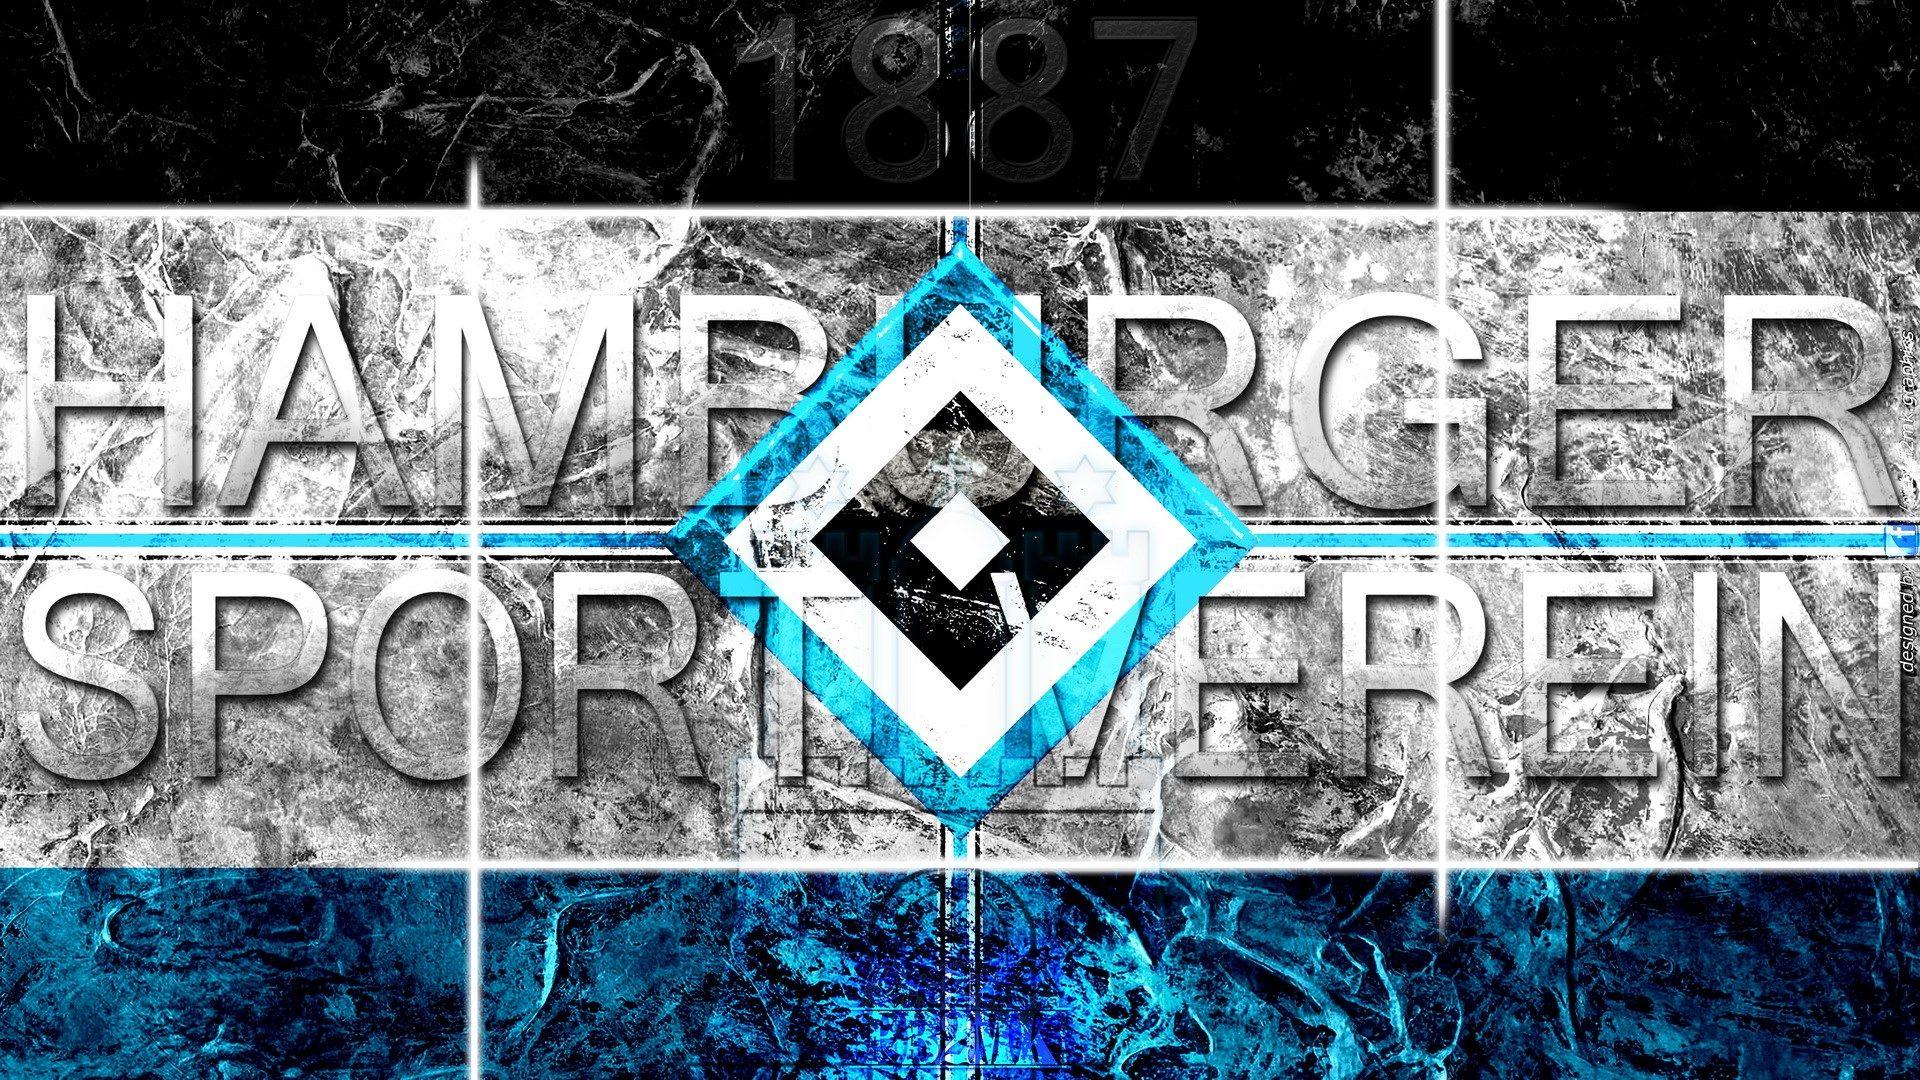 hamburger sv logo 1280x800 wallpaper, Football Pictures and Photos